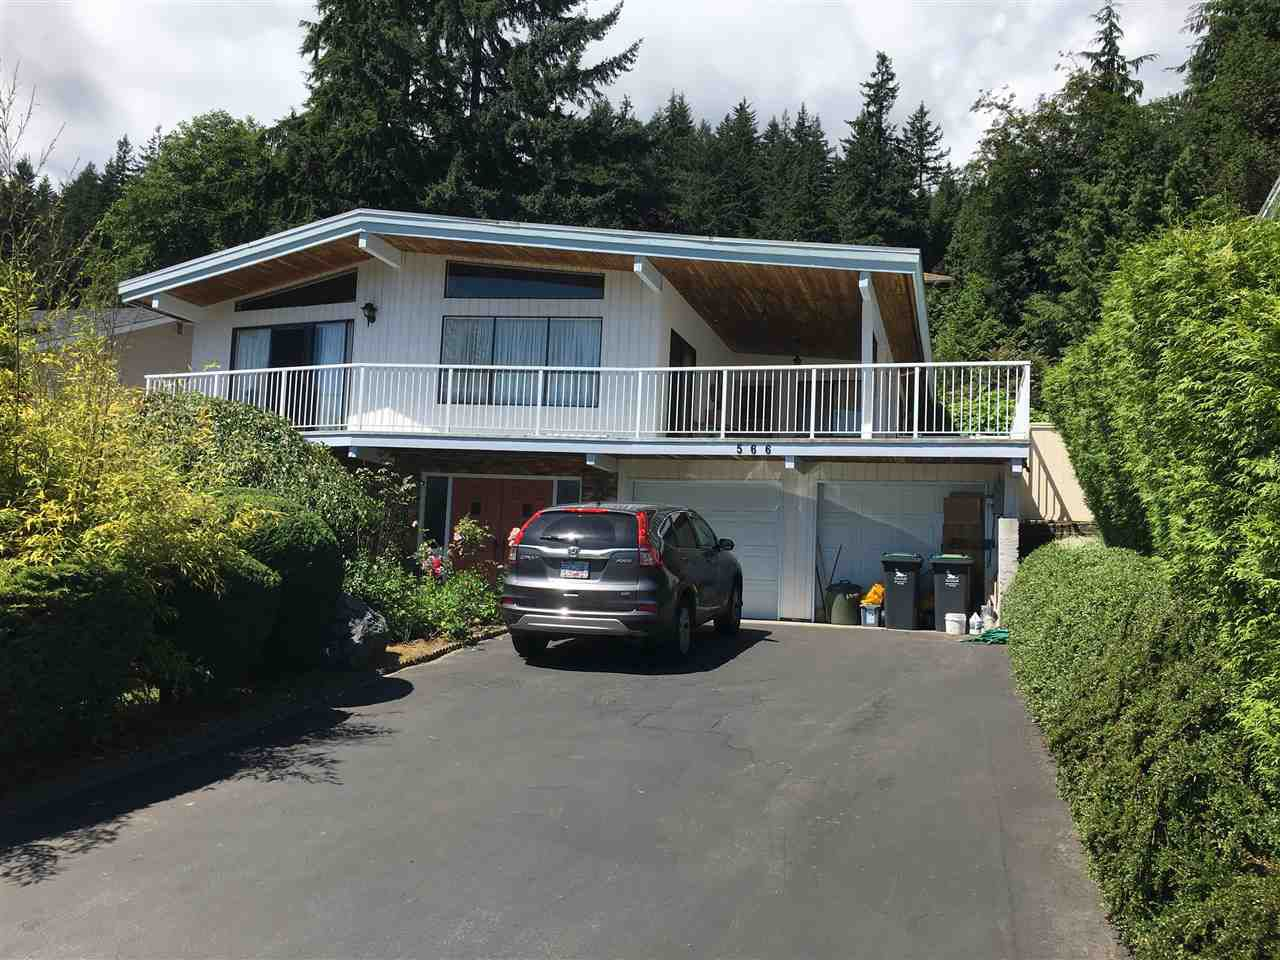 Main Photo: 566 E BRAEMAR Road in North Vancouver: Braemar House for sale : MLS®# R2191399